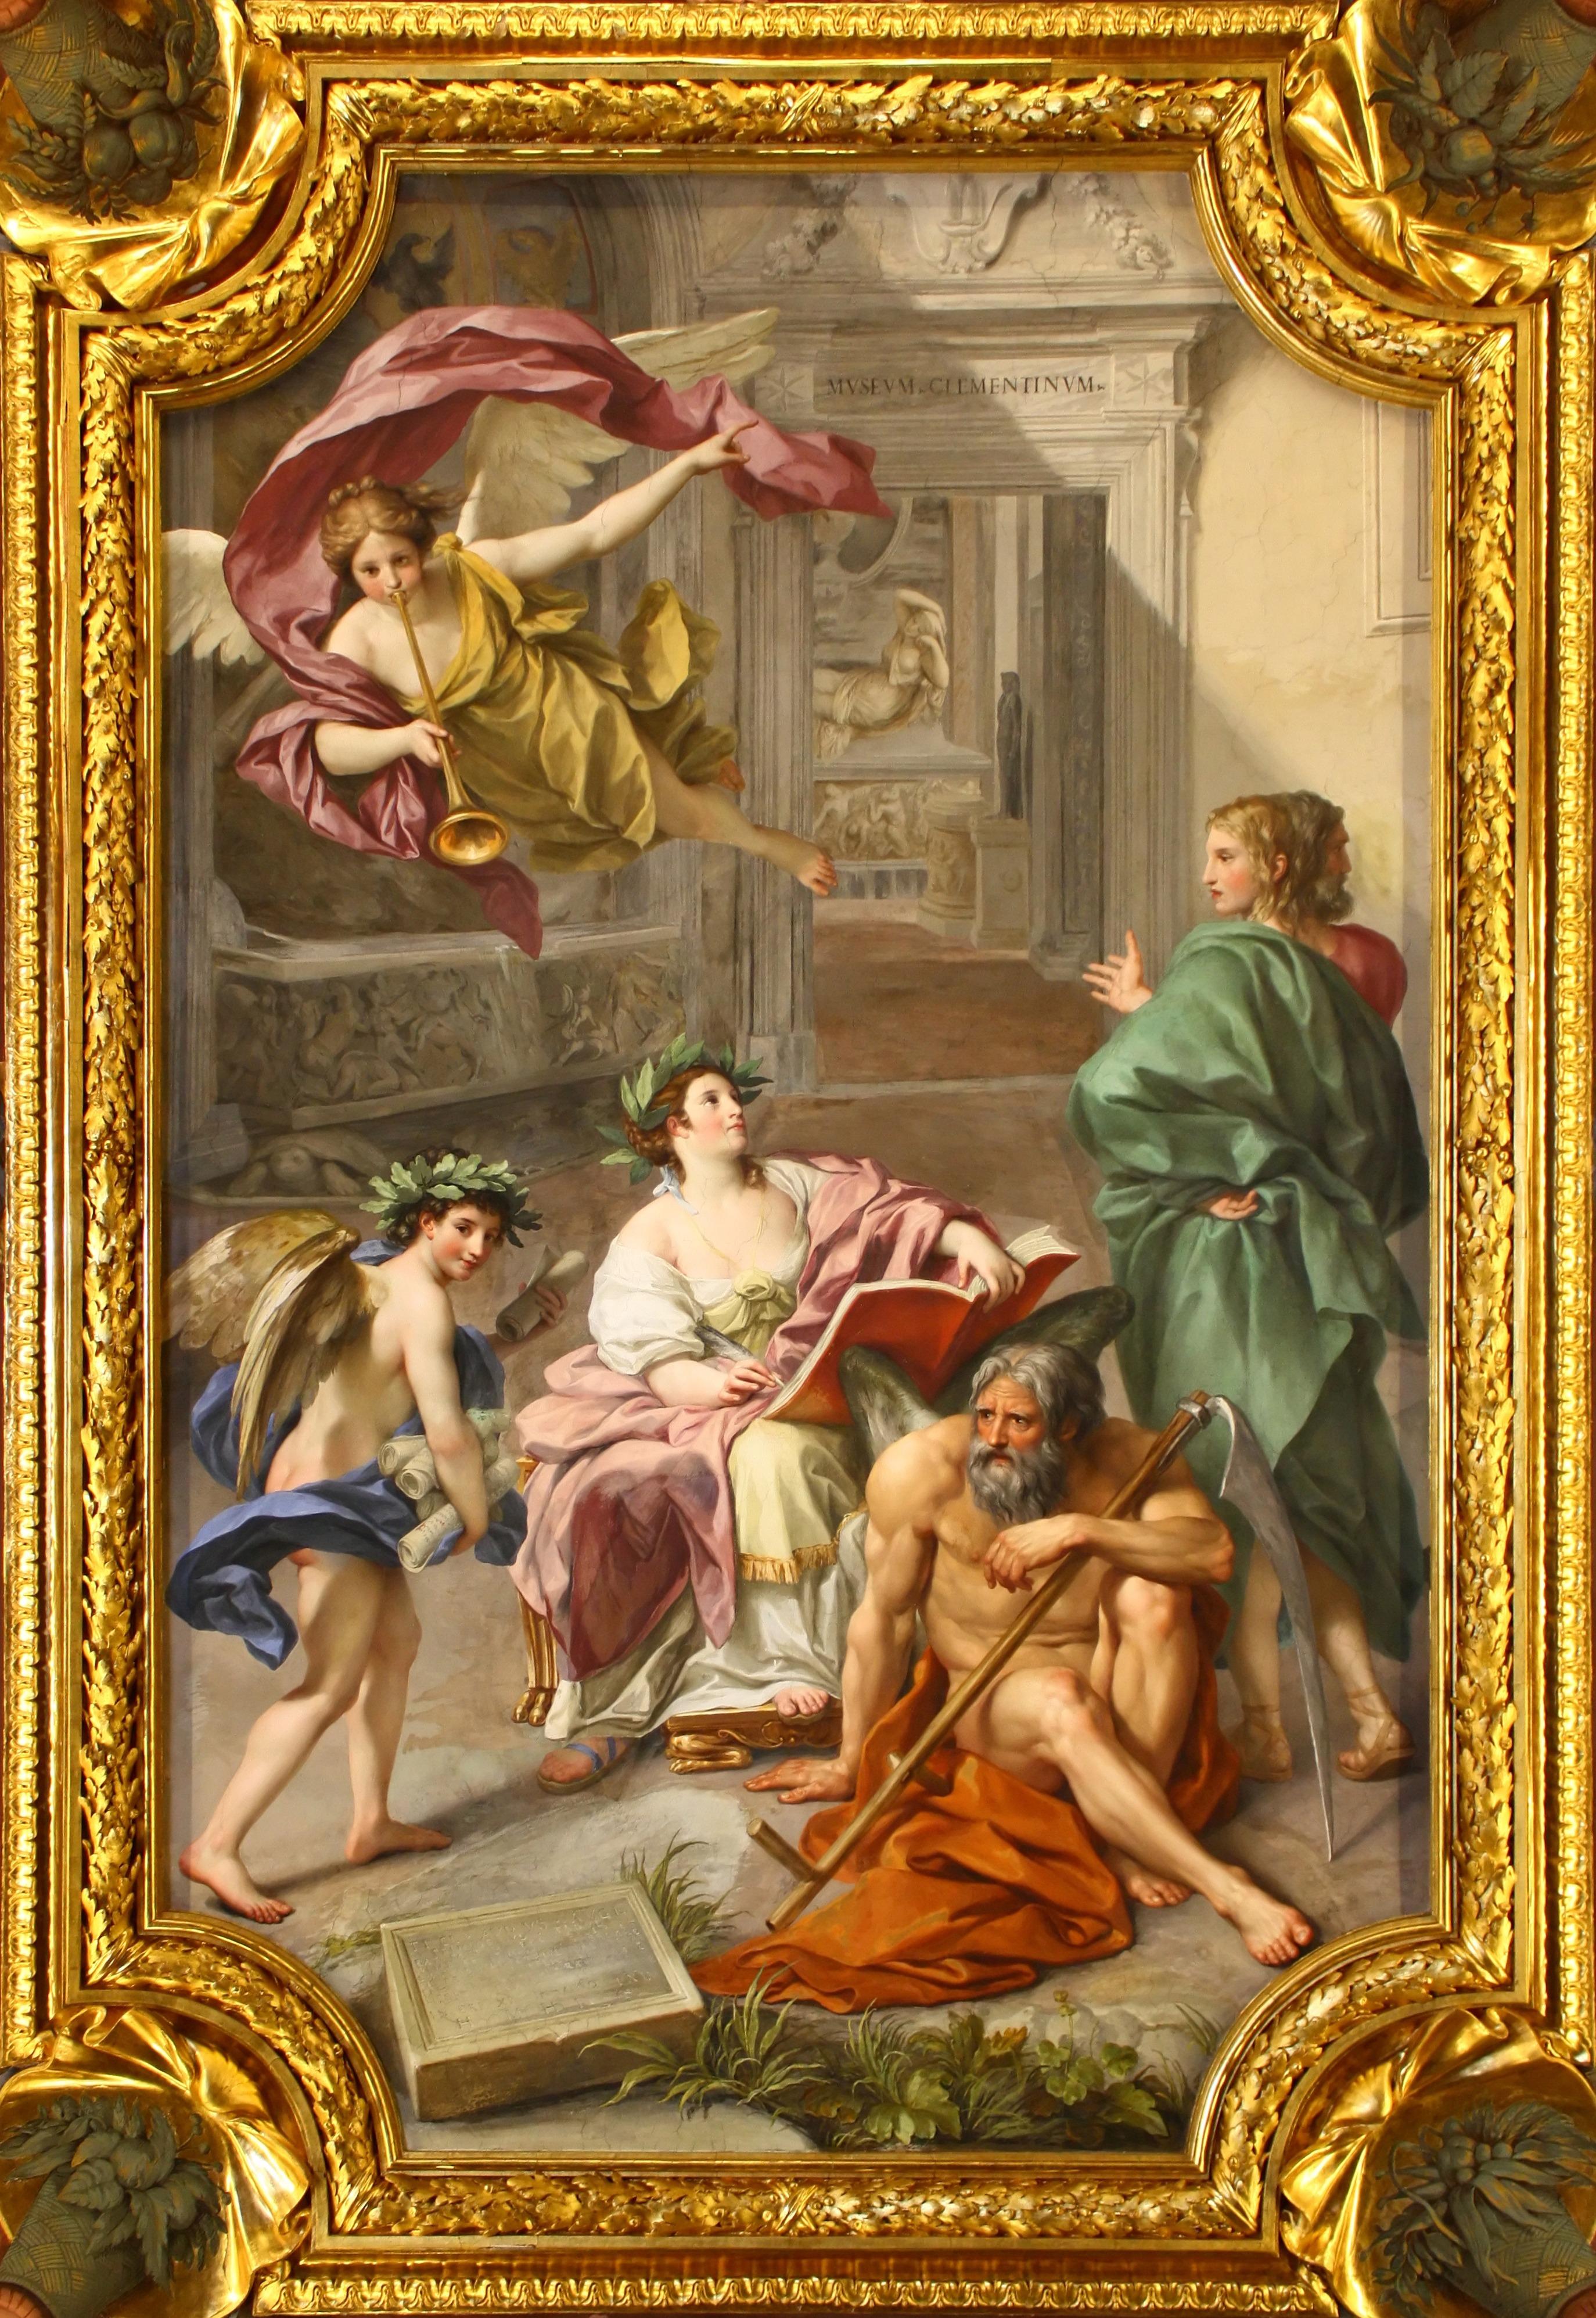 Fotos gratis : marco, pintura, ornamento, ángel, art, altar, mural ...